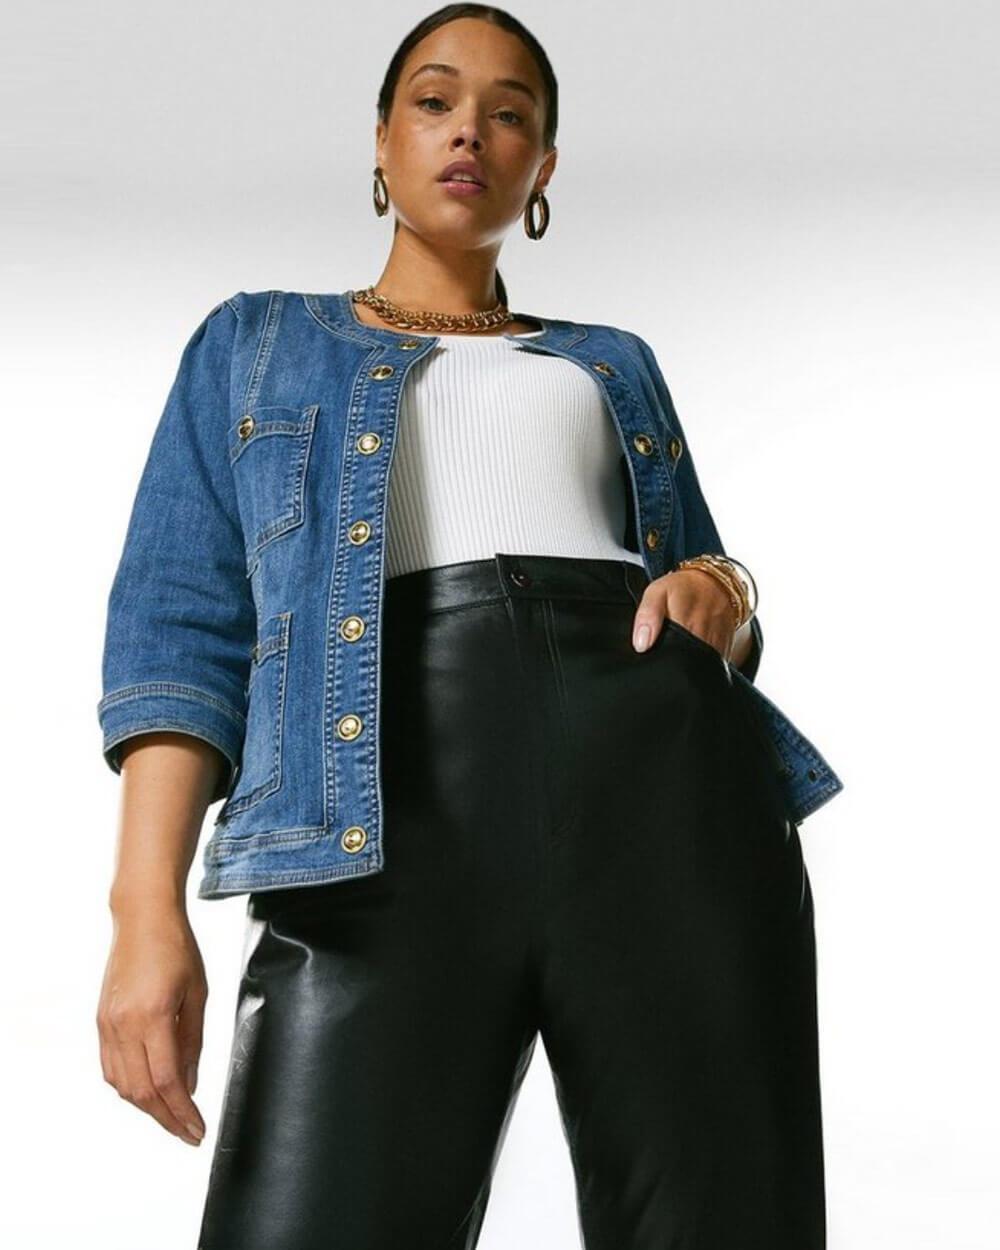 Karen Millen plus size clothing